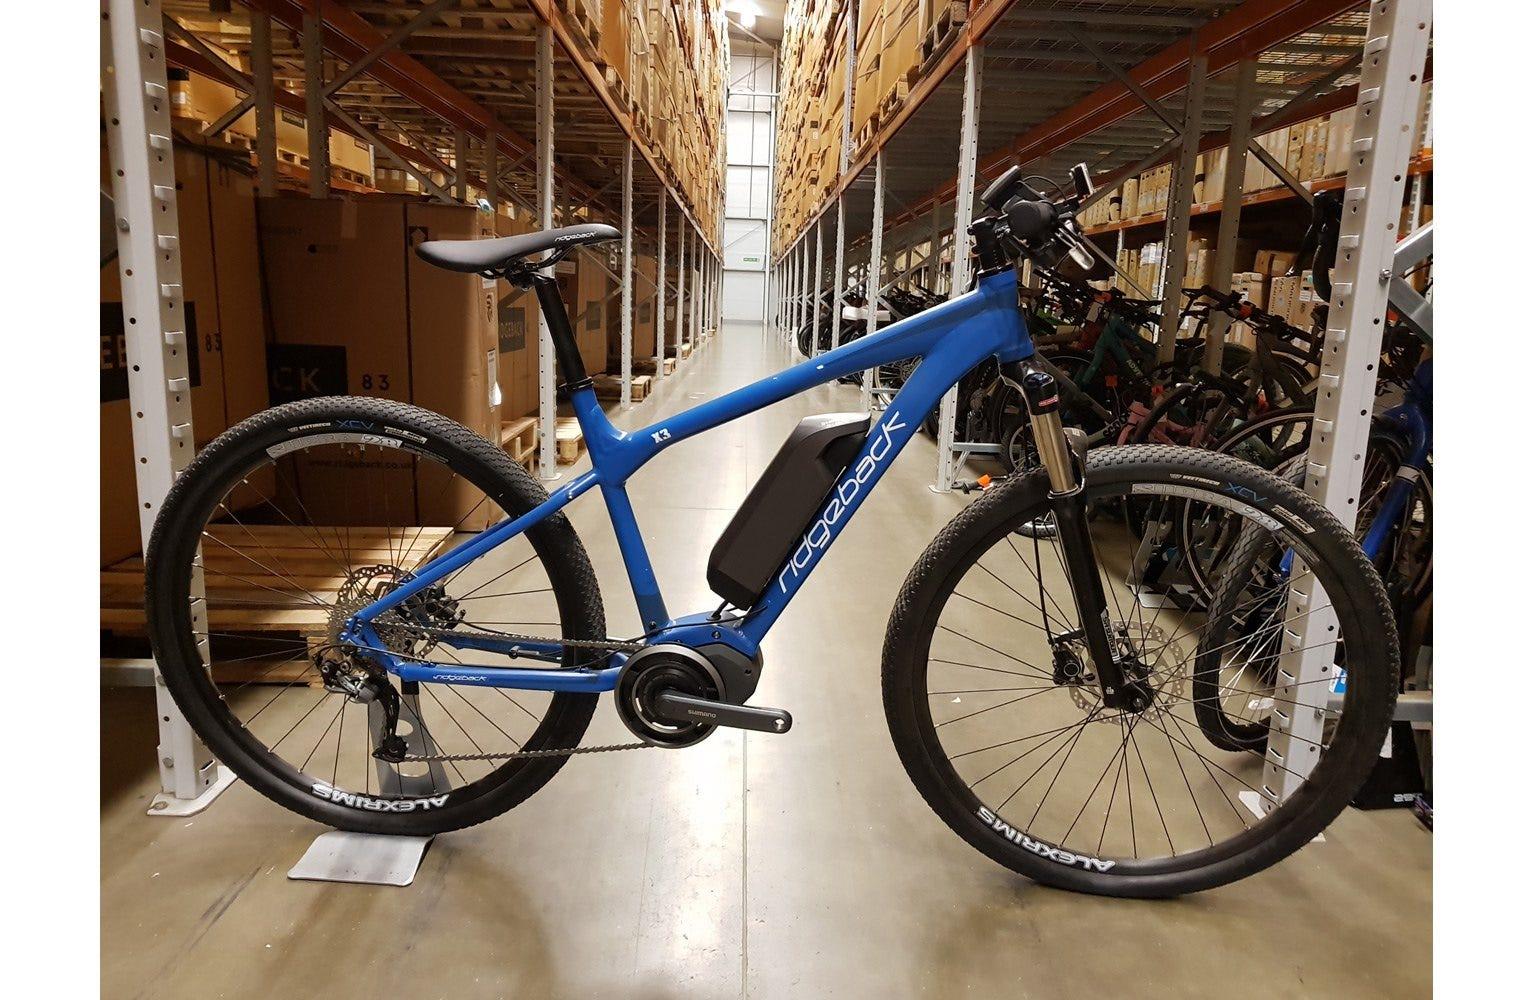 Ridgeback X3 17 inch Ex Display Bike